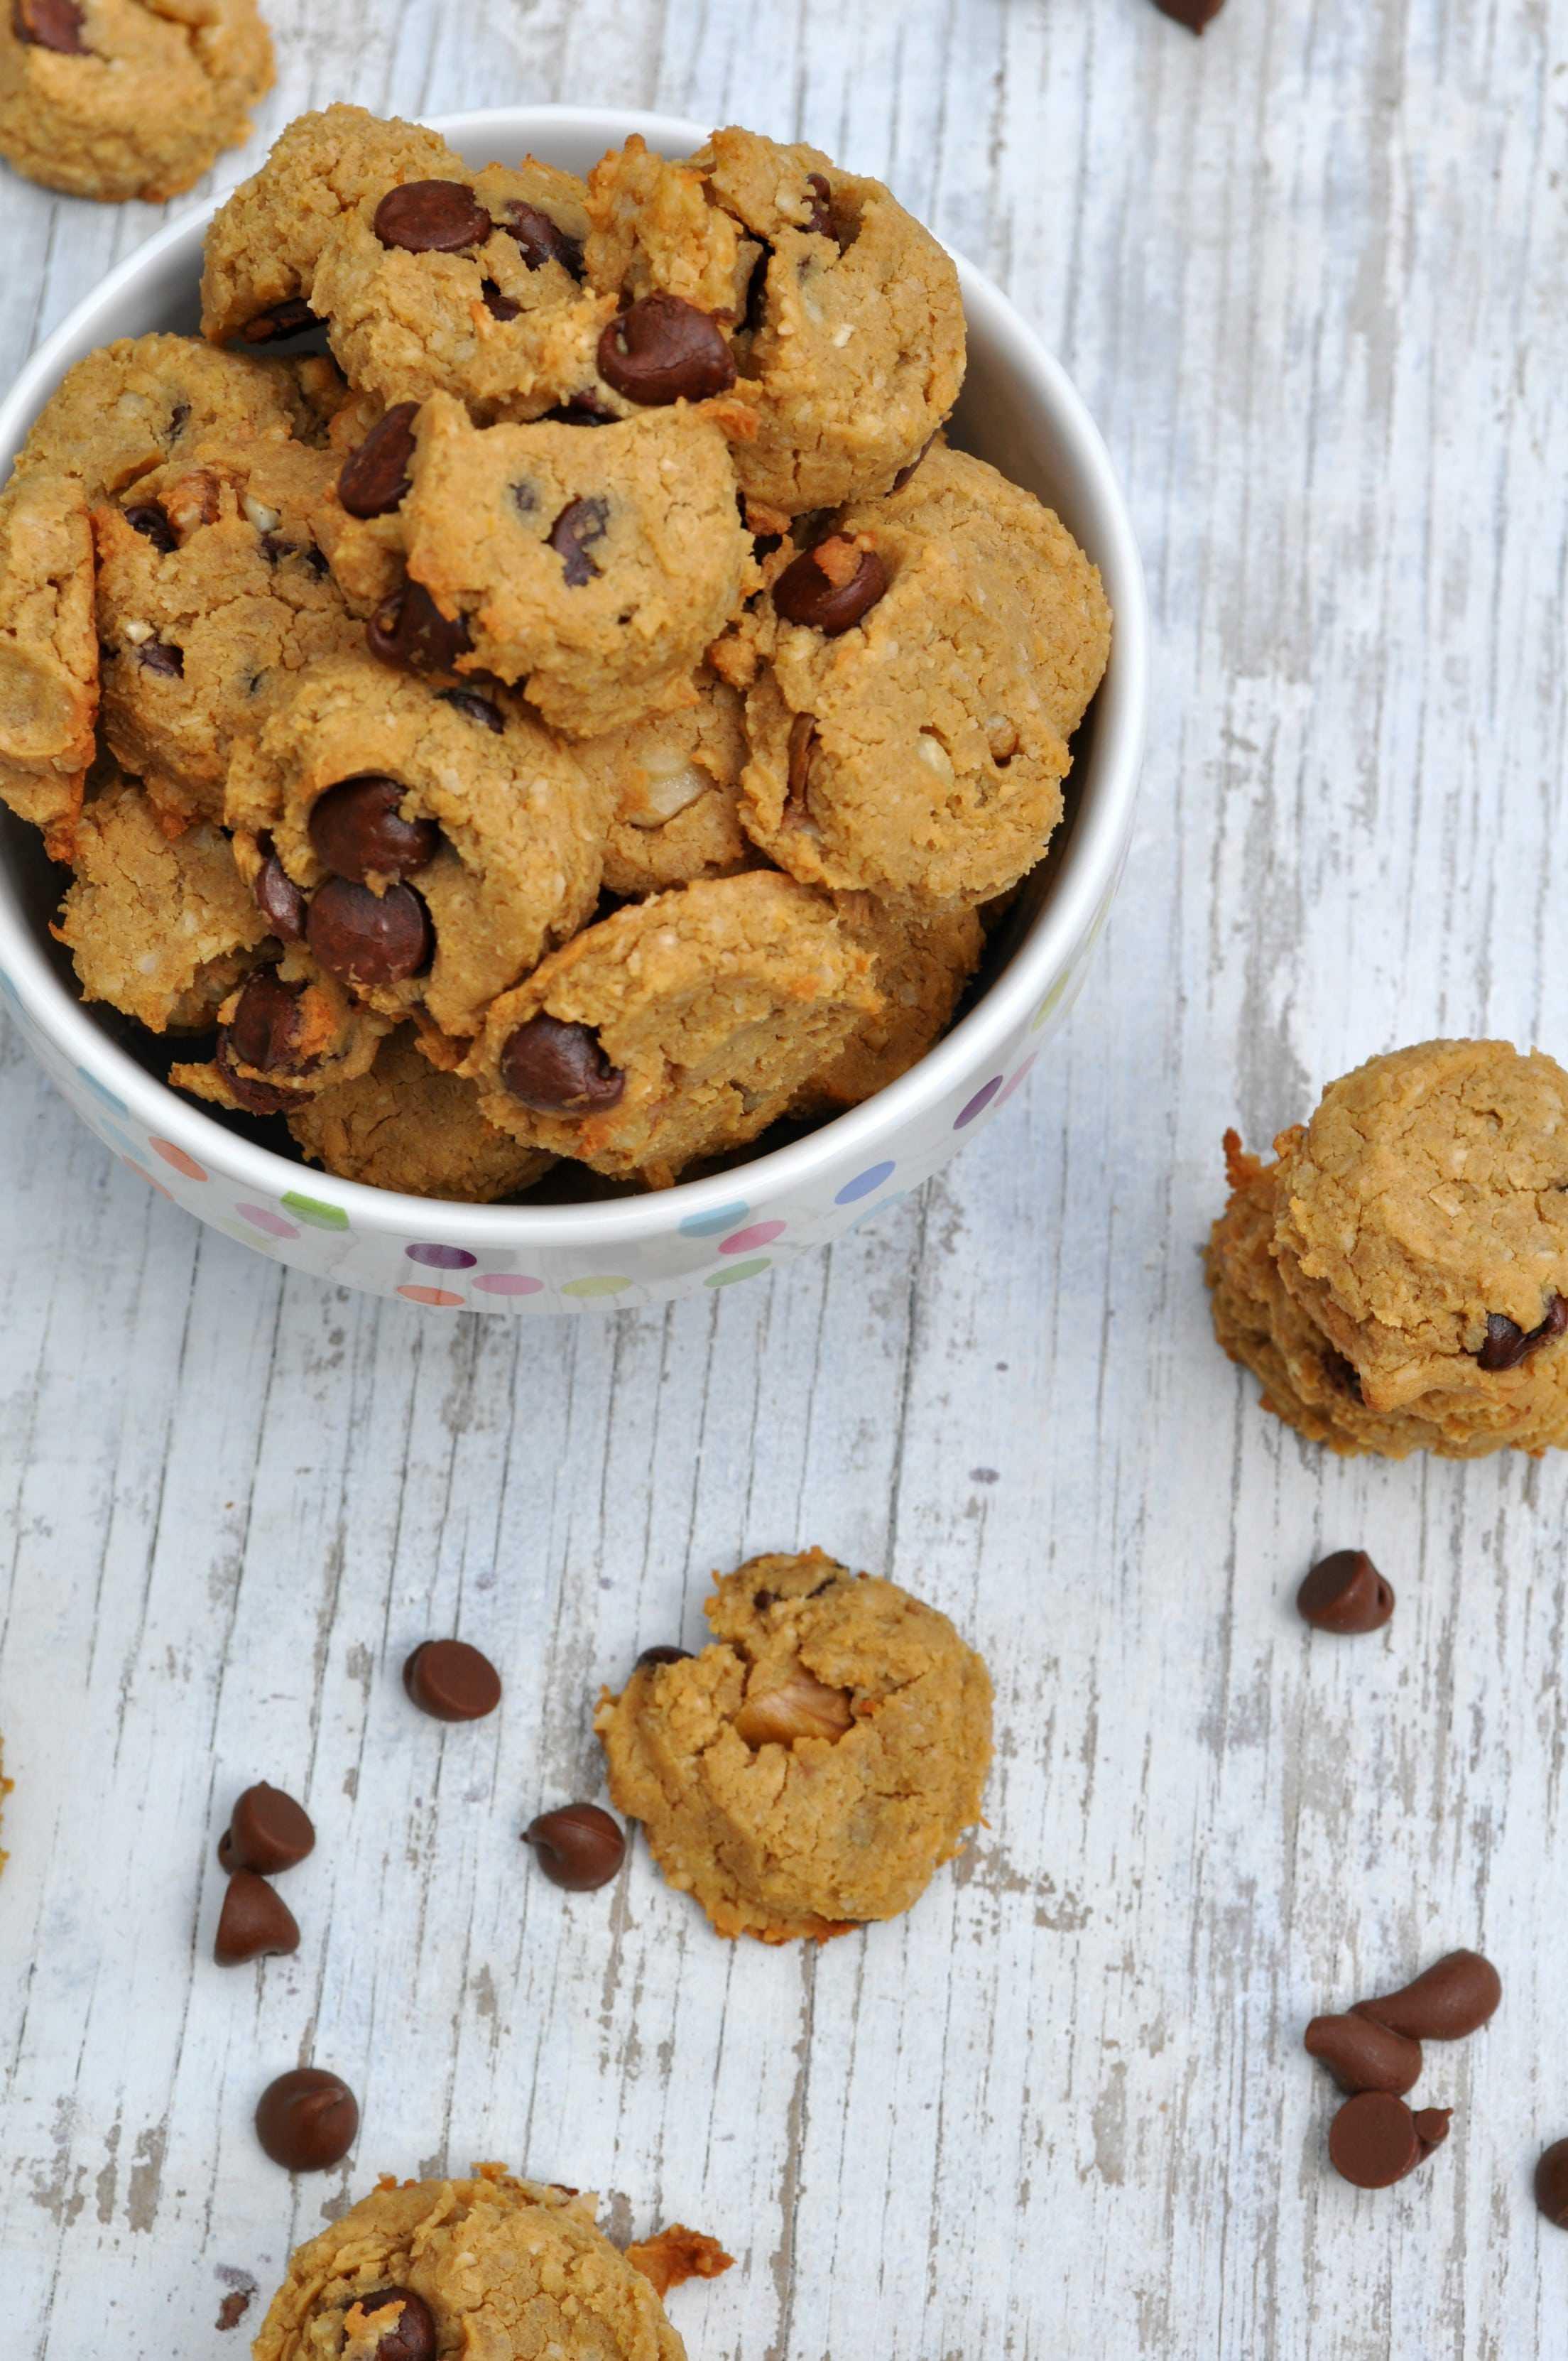 2-Bite Flourless Chocolate Chip Cookies - The Seasoned Mom